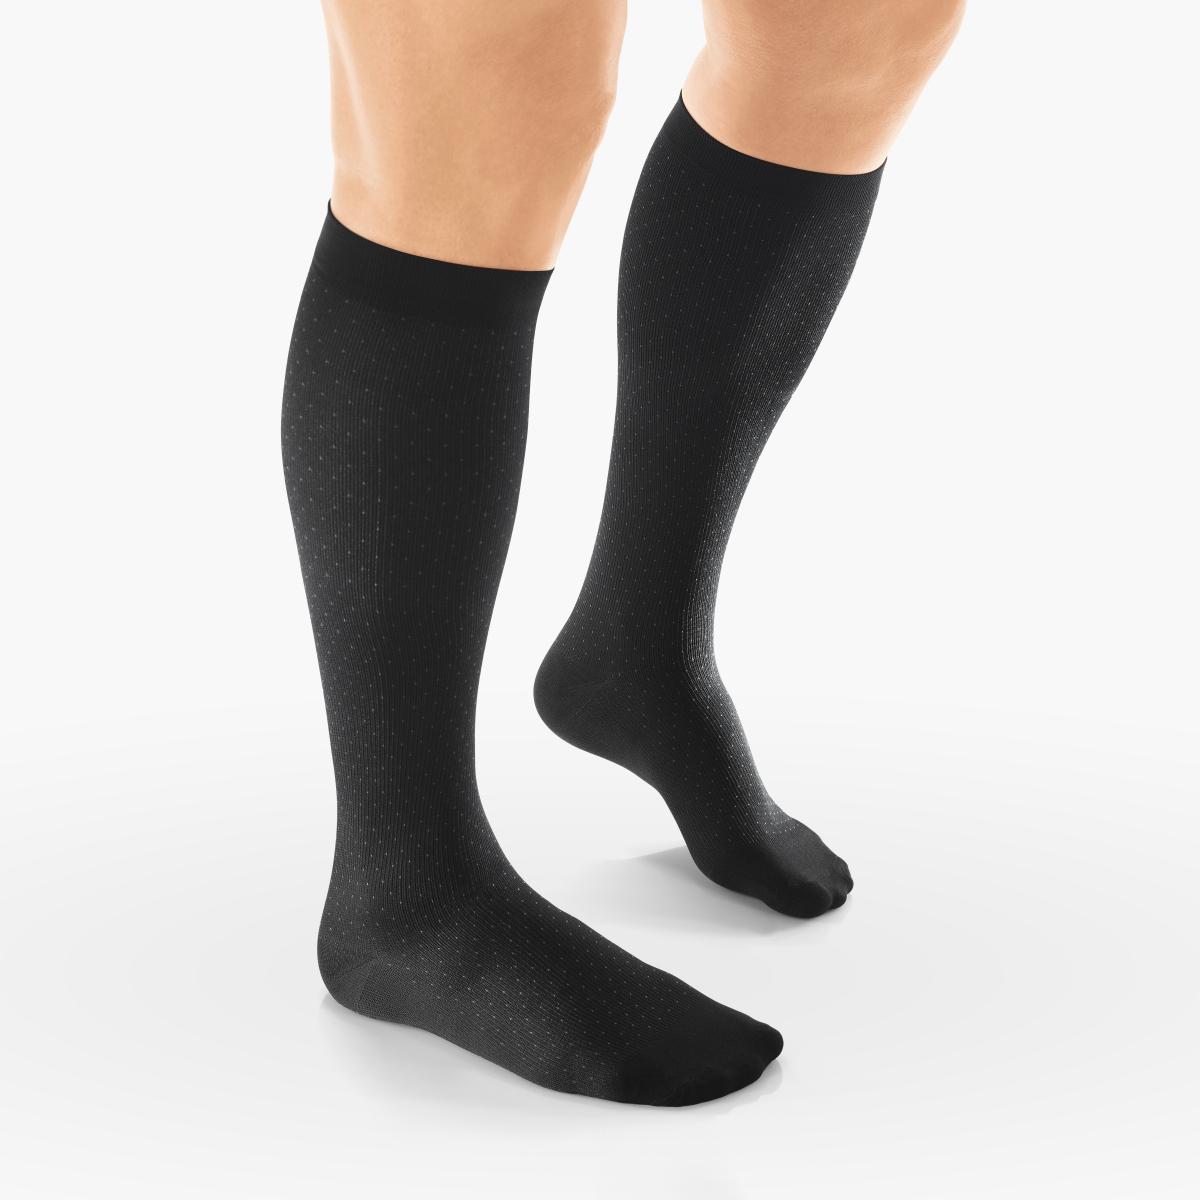 VENOSAN Sup F Men, Pin Dot,  Below Knee 15-20, Black, M Moderate 15-20 mmHg | Black | M |  | Closed Toe | Knit Top